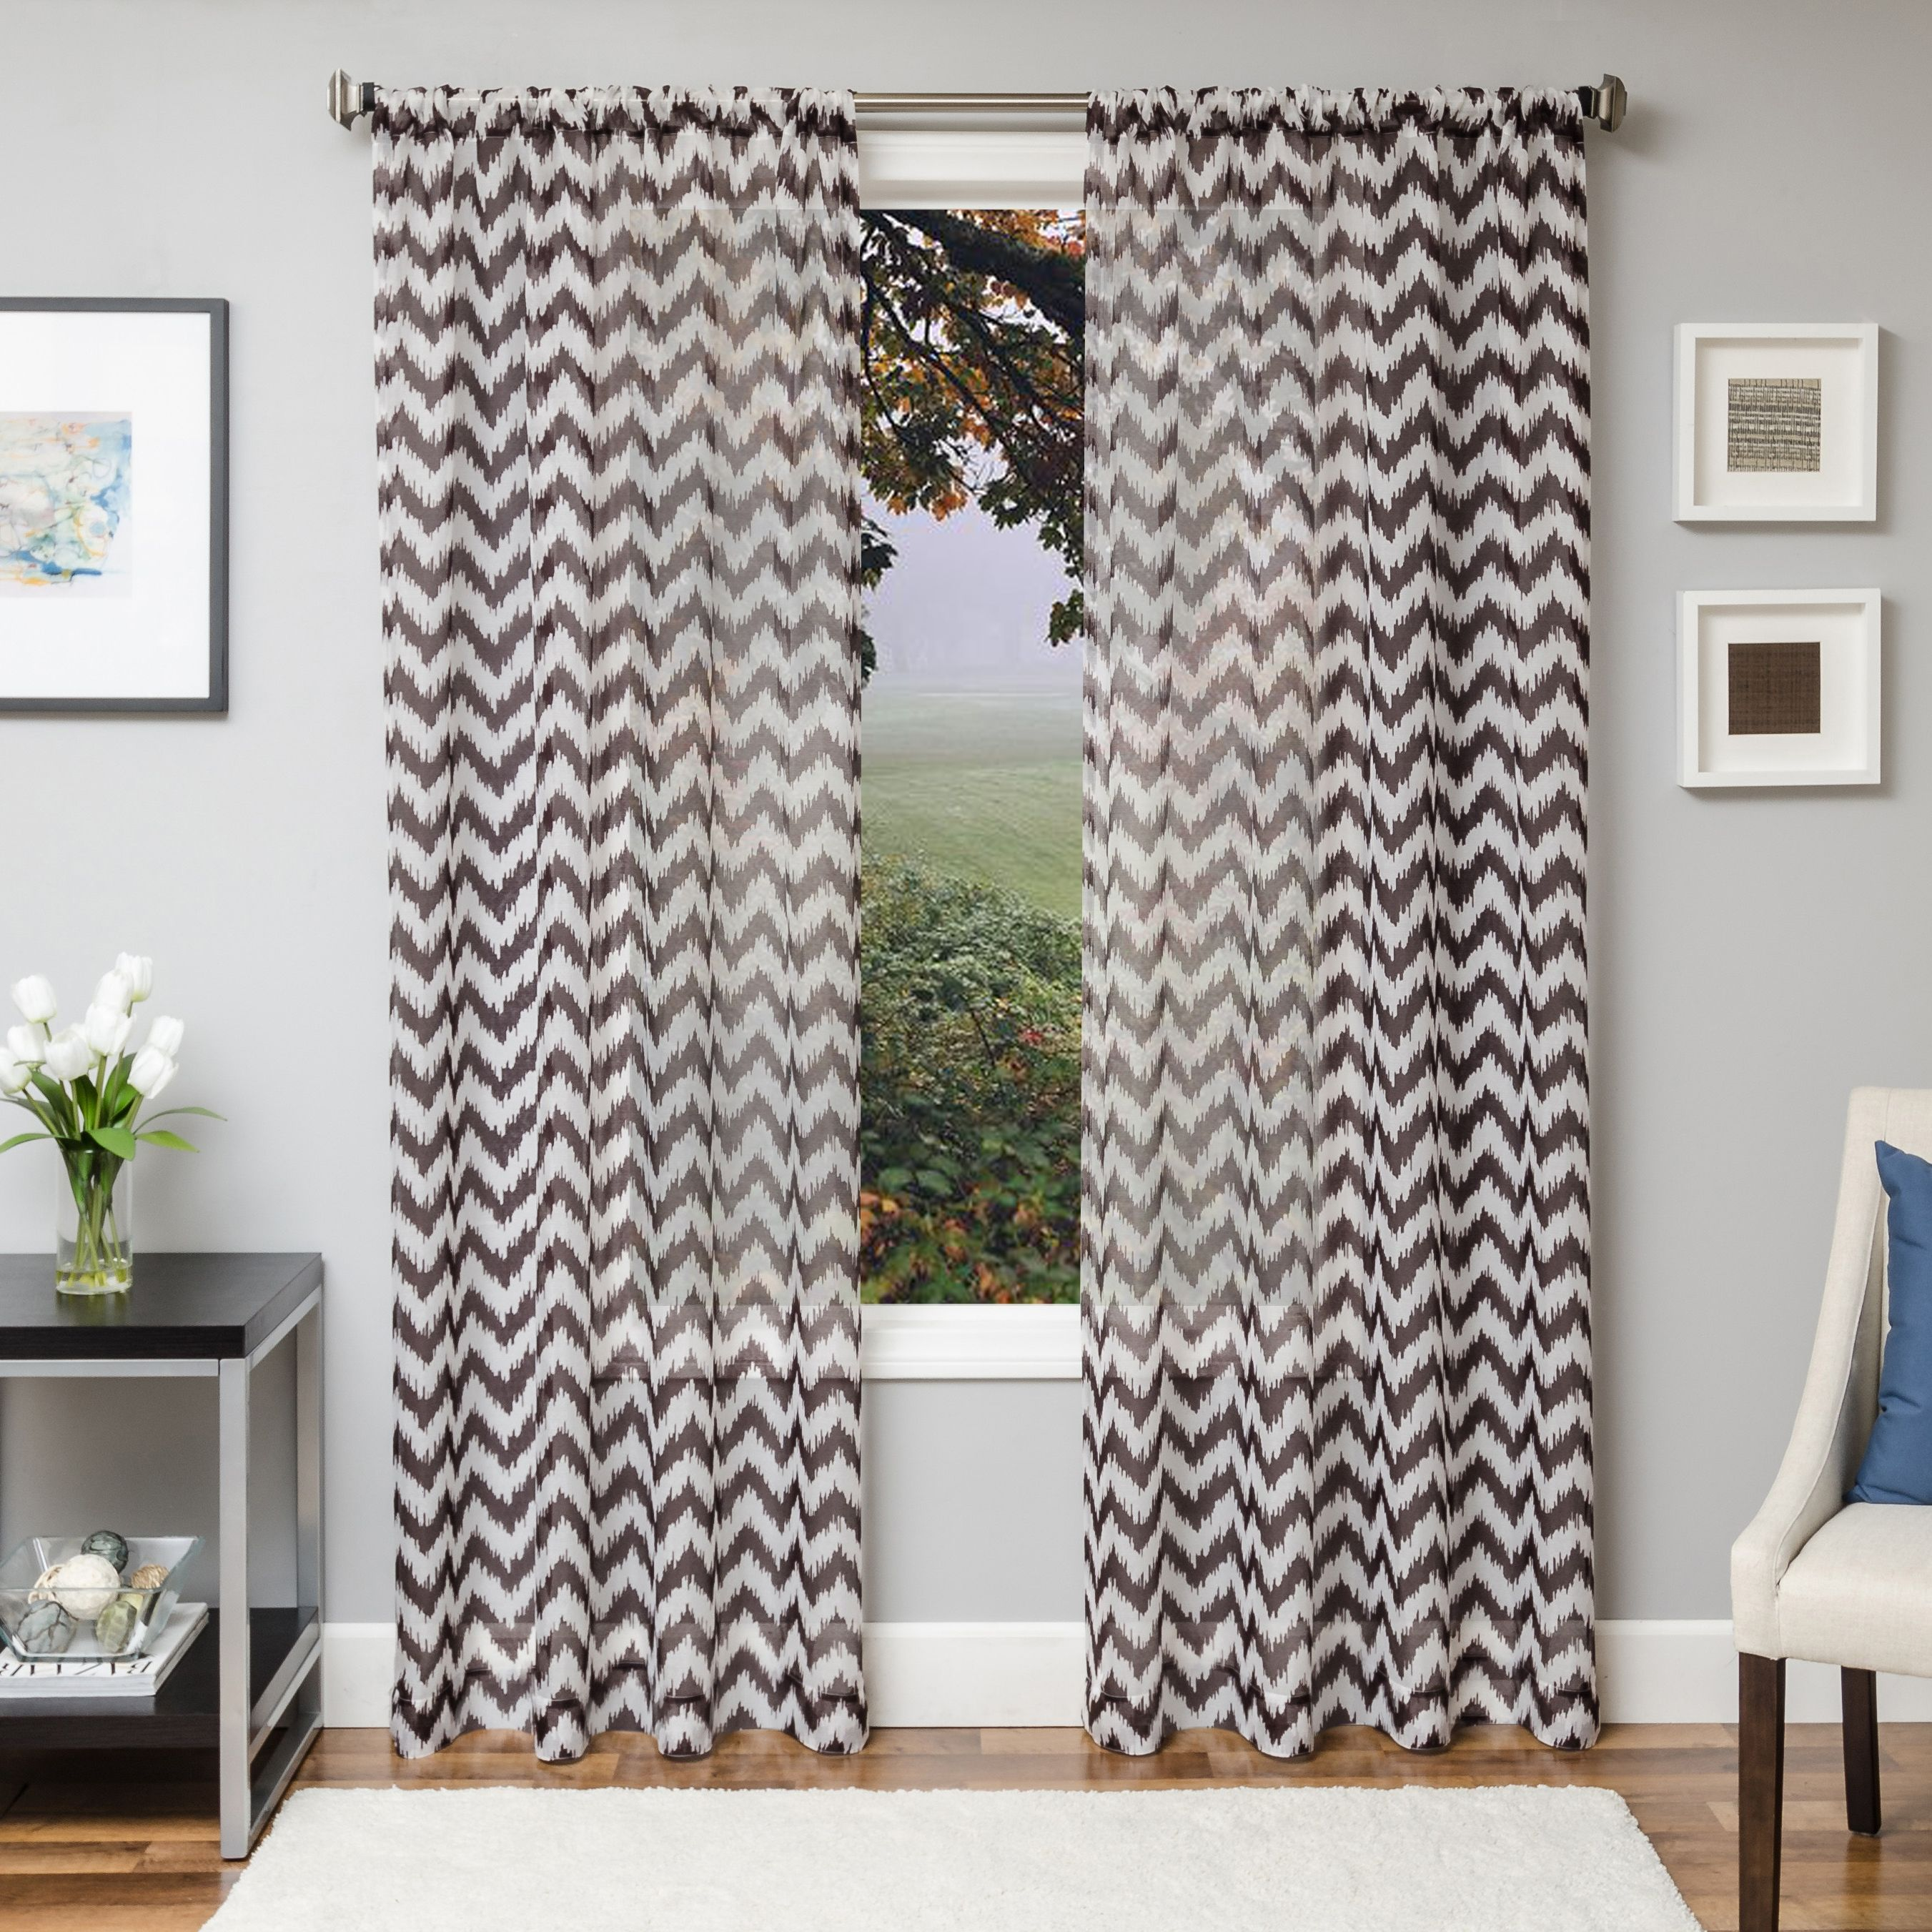 Lyra 96 Sheer Chevron Panel Curtain Chocolate Sheer Curtain